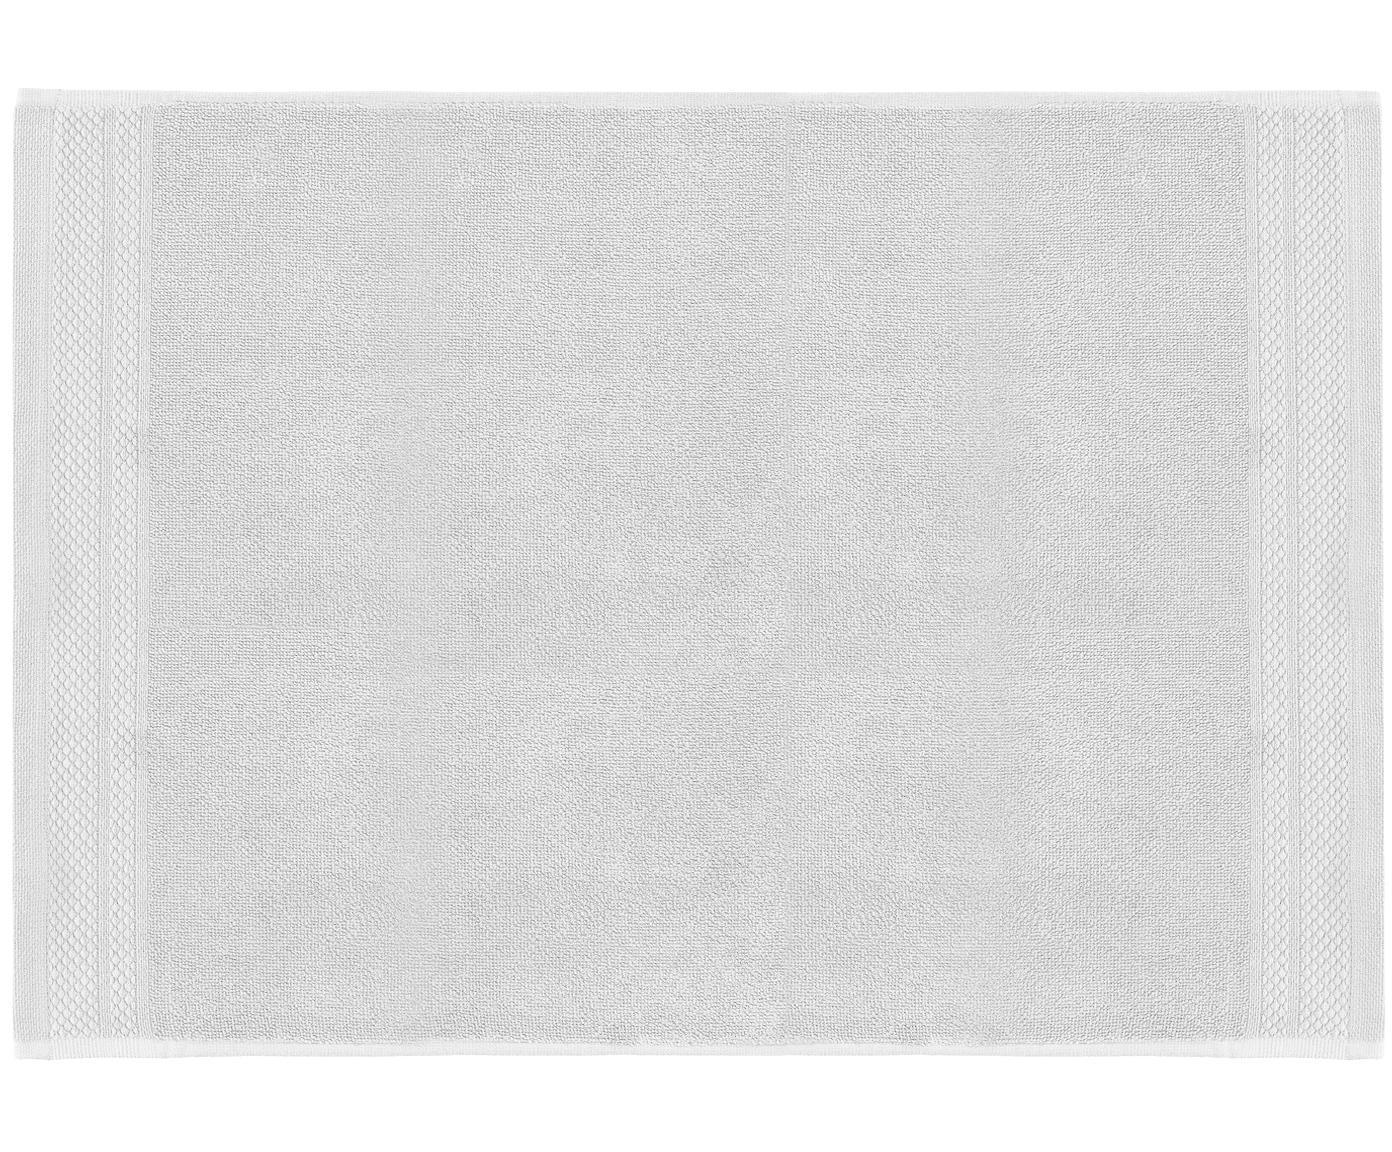 Badmat Premium, 100% katoen, zware kwaliteit, 600 g/m², Lichtgrijs, 50 x 70 cm